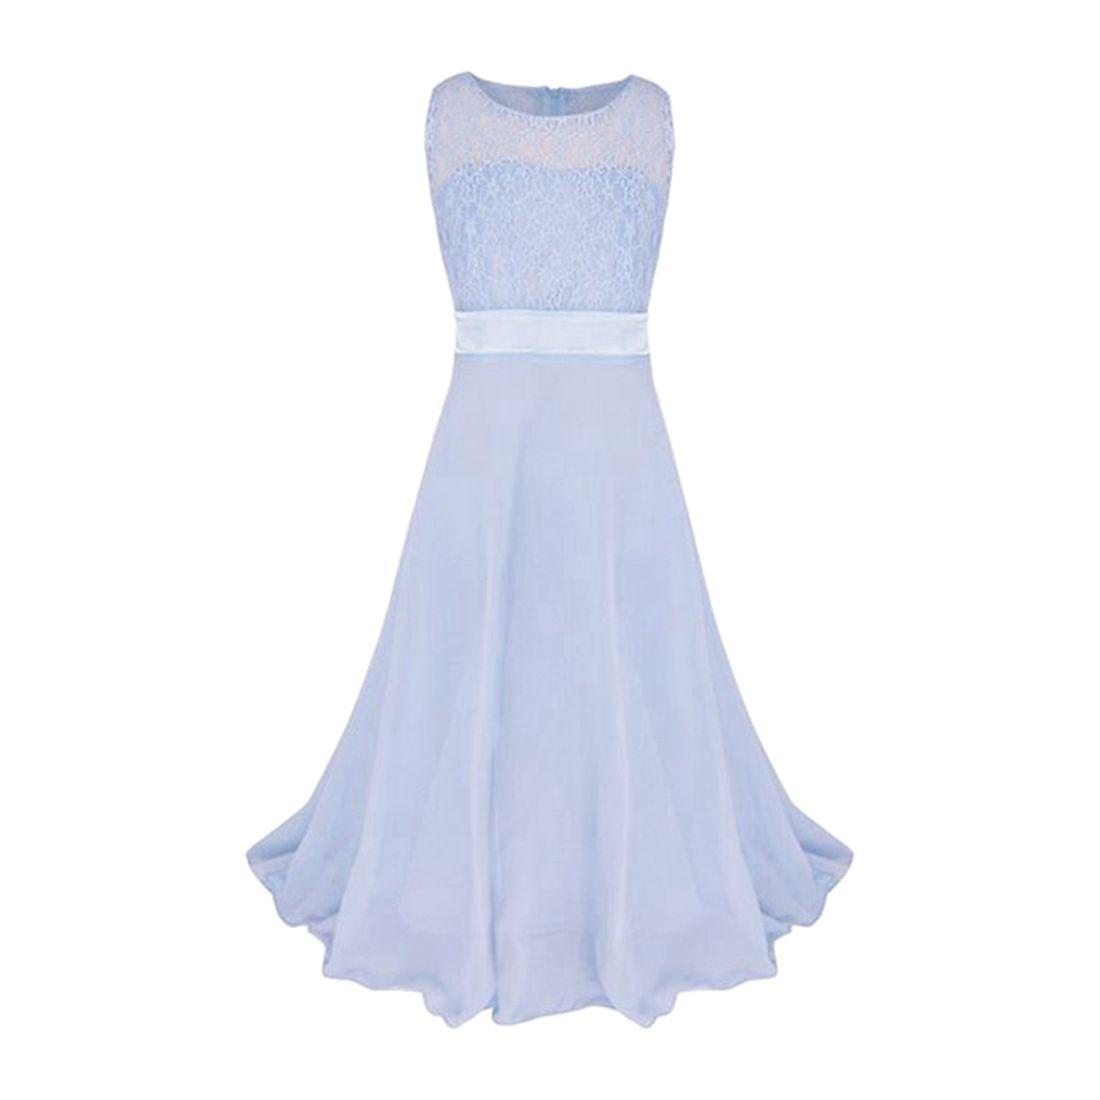 MACH Girls Lace Flower Chiffon Long Dress Kids Beautiful Wedding Party Dress Girl Formal Party Princess Long Dress(Sky Blue)